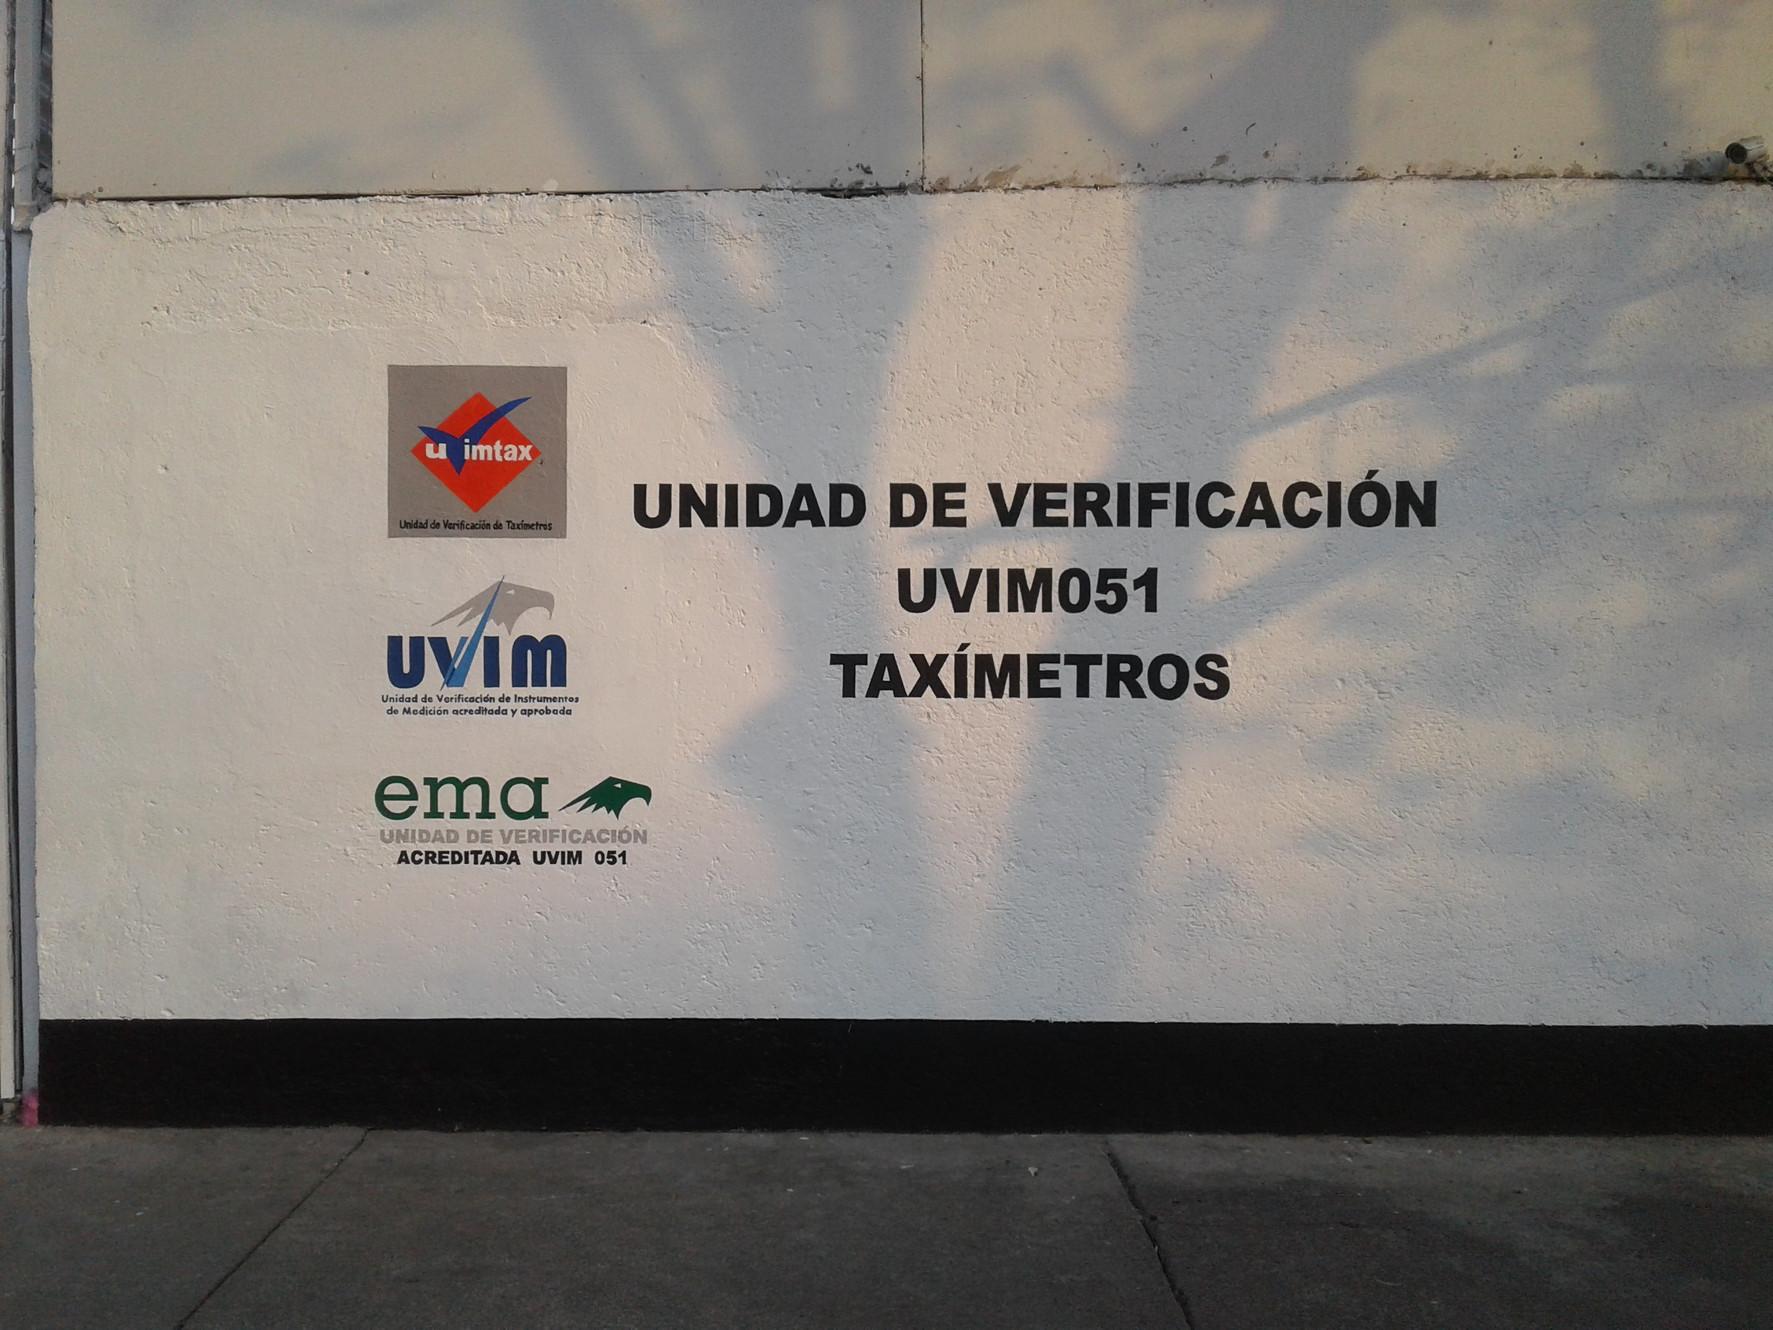 Calendario De Verificacion Fisico Mecanica 2019.Revista Taxi 2019 Revista Vehicular 2019 Cdmx